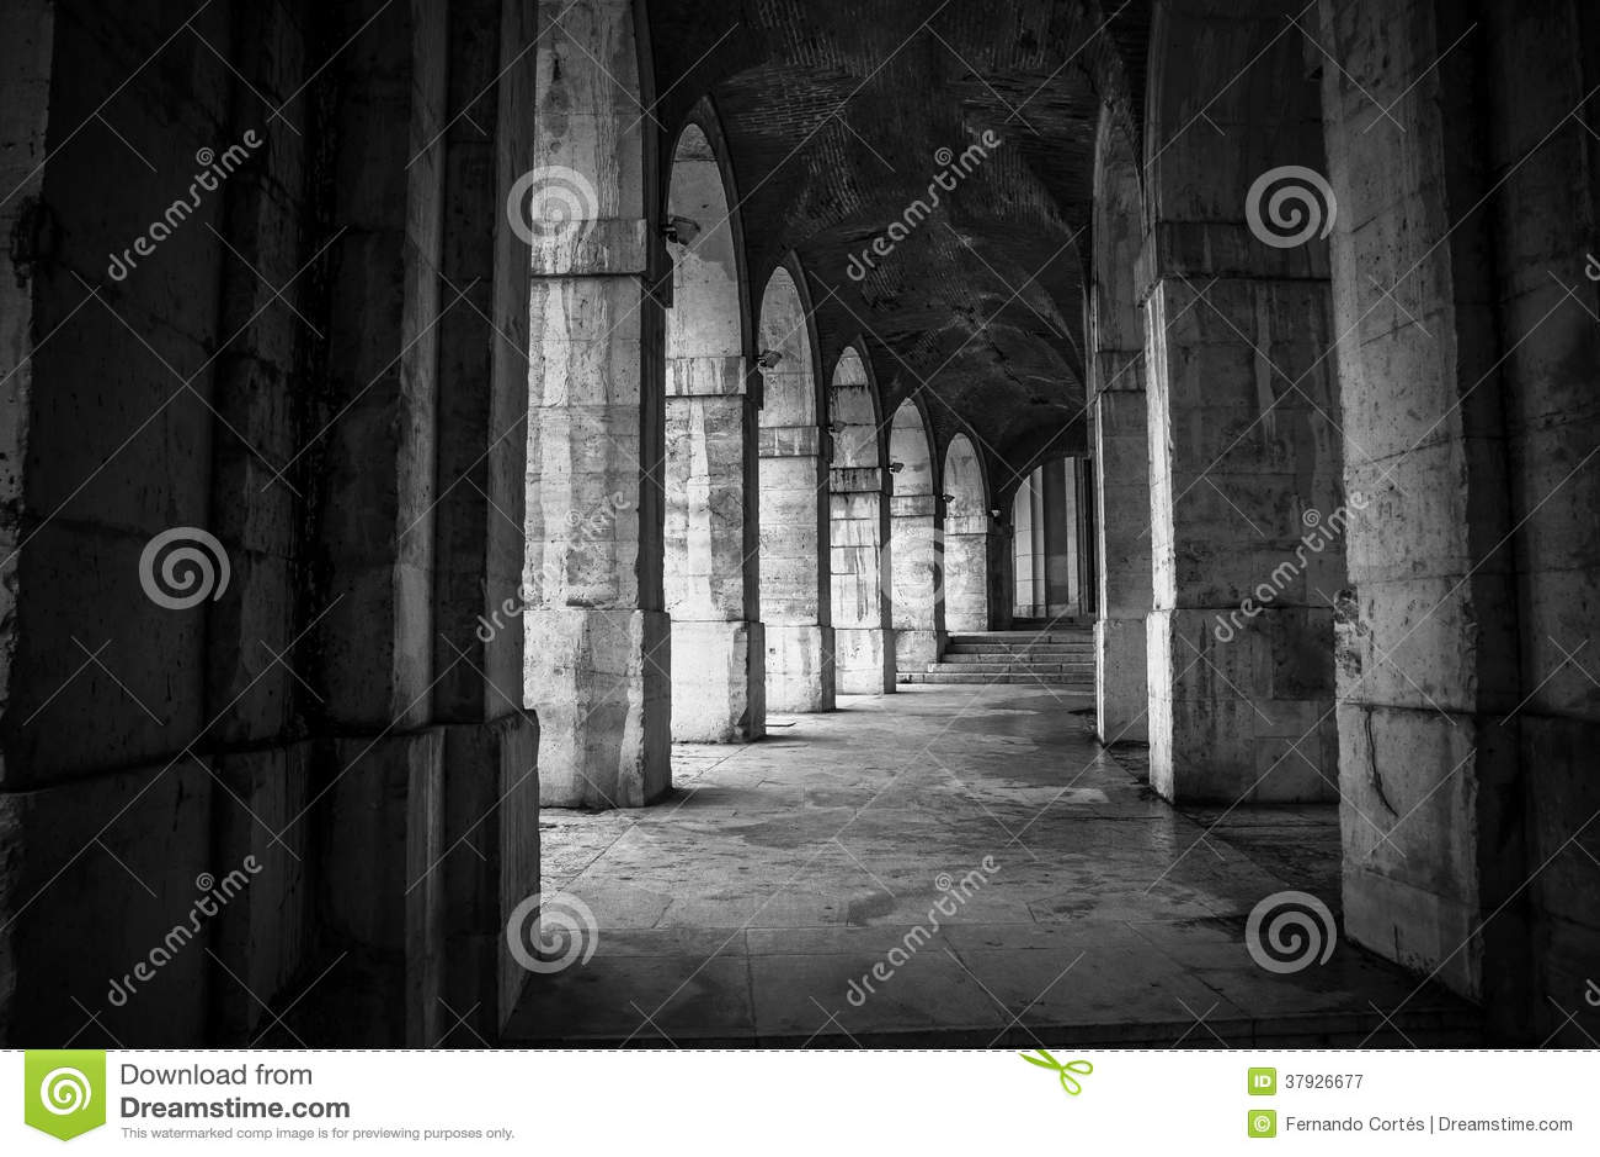 Церковь Сан Антонио. Дворец Аранхуэса, Мадрида, Spain.World h